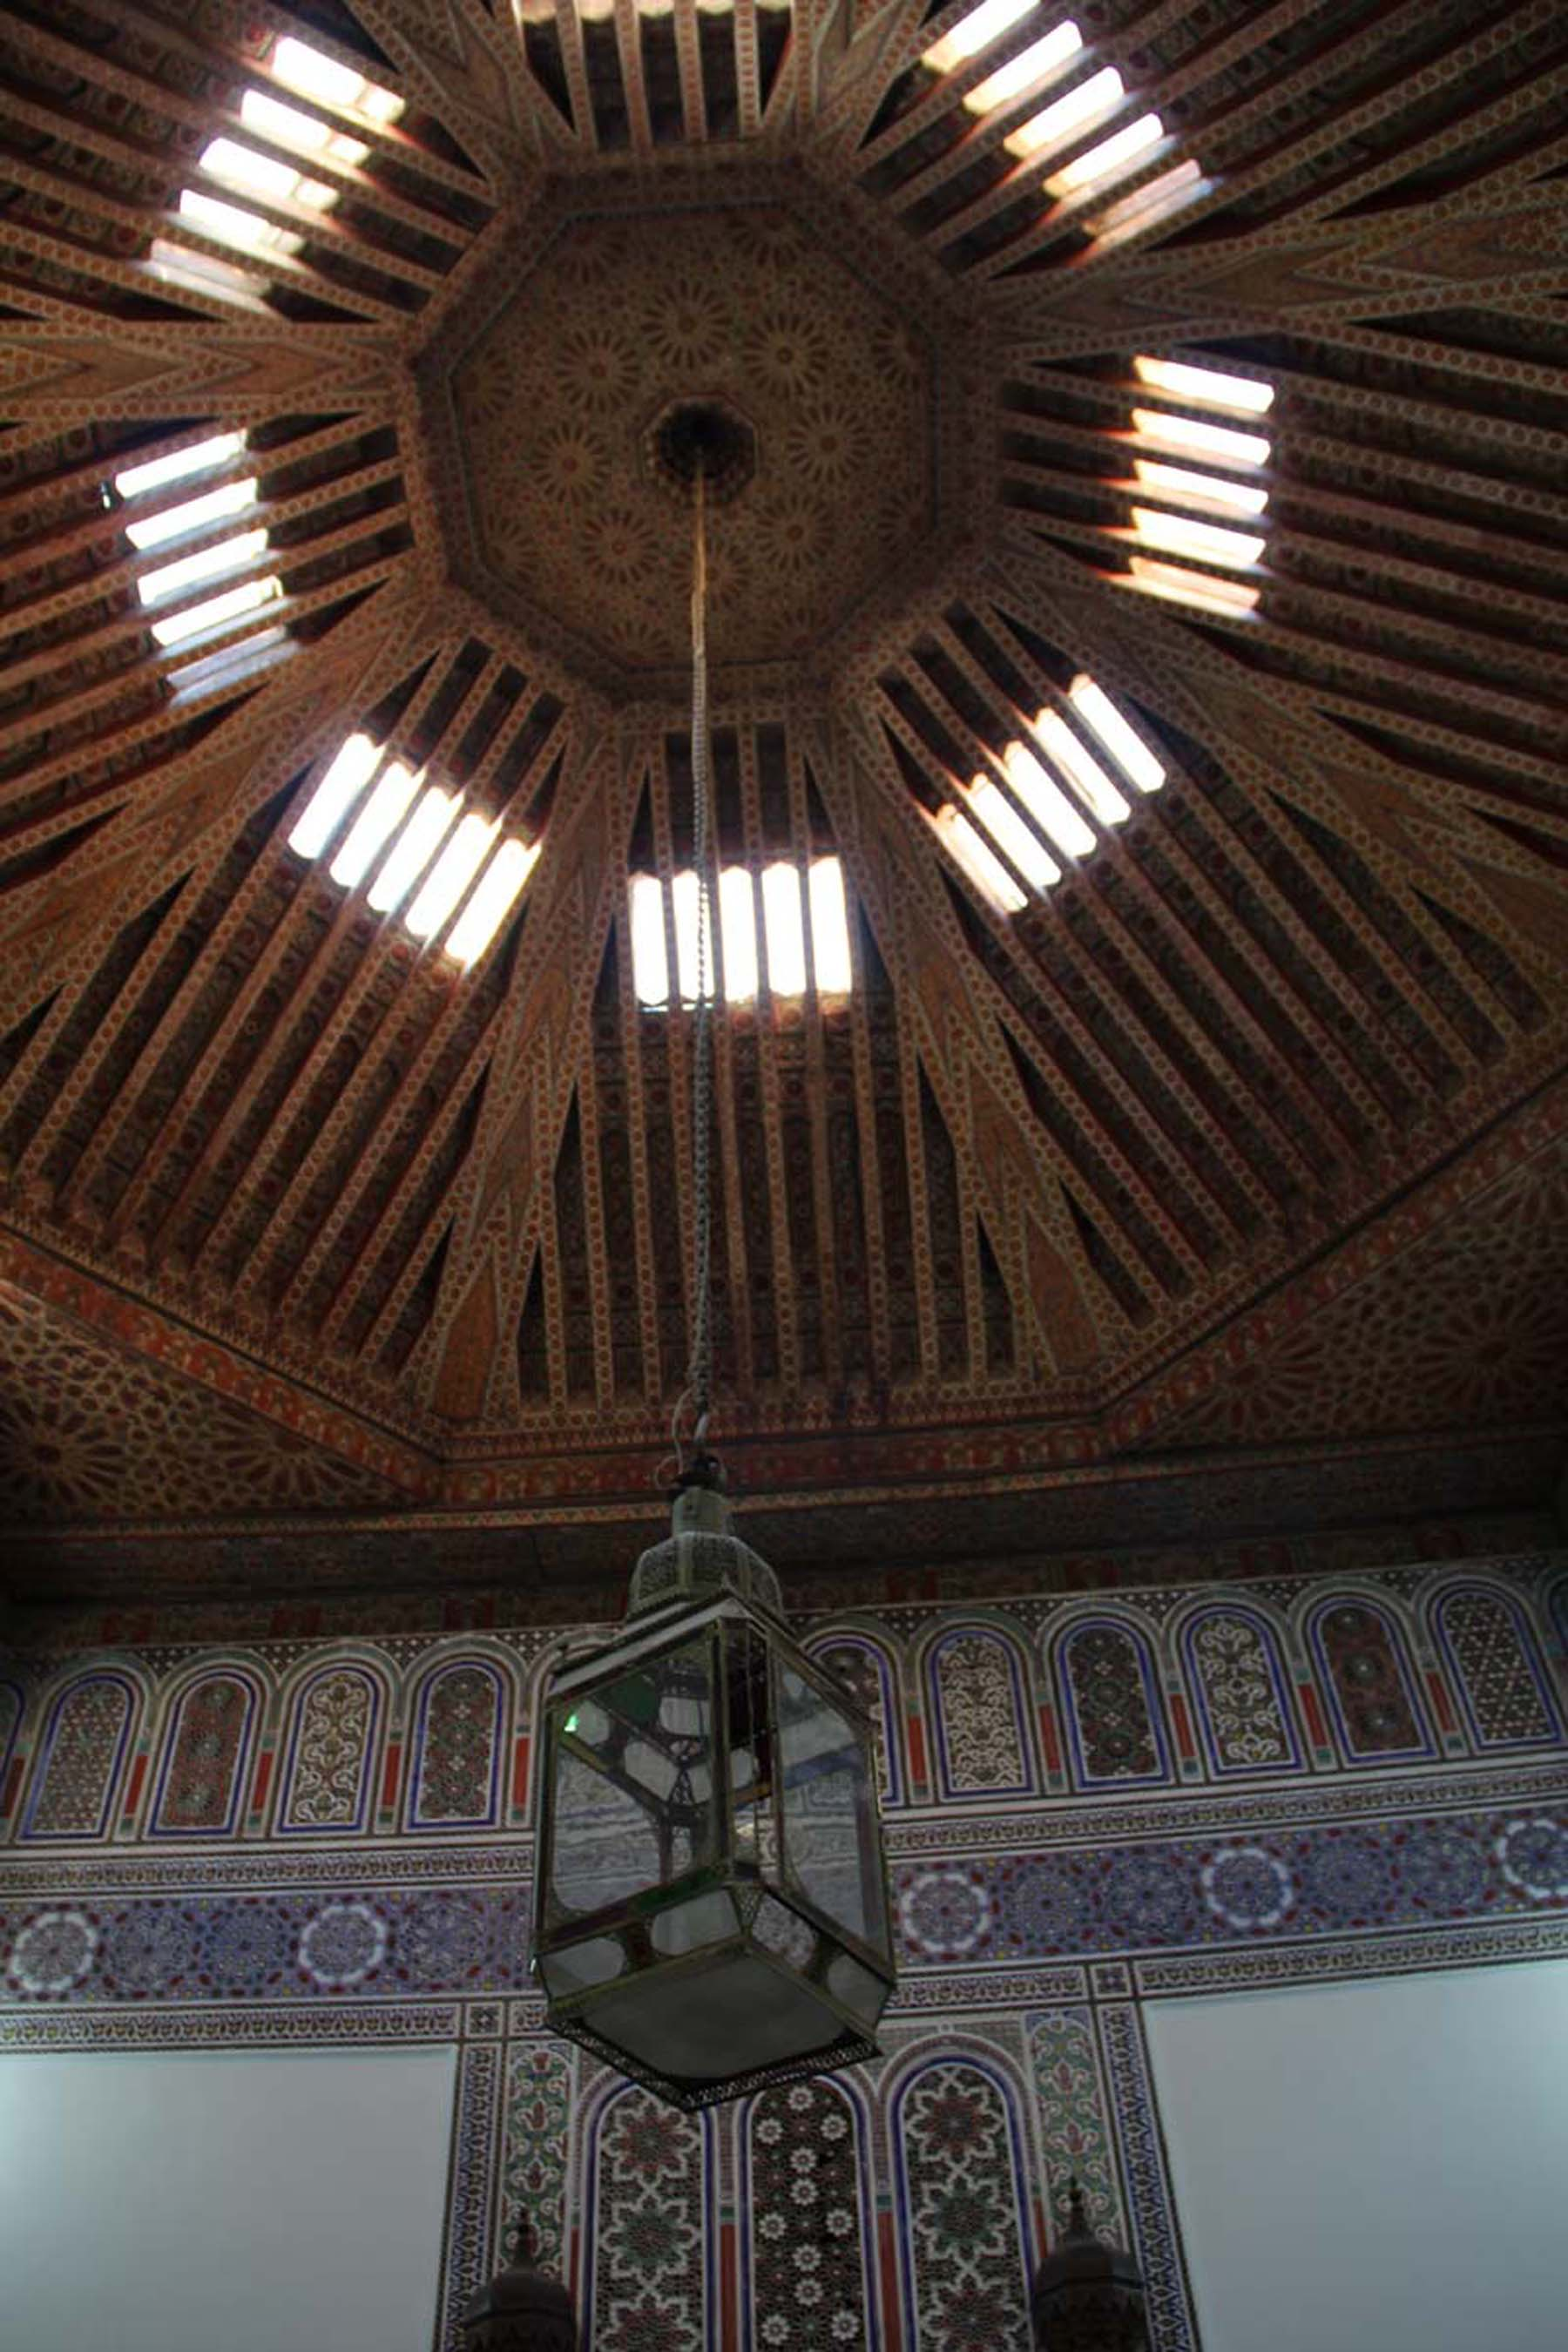 Ceiling lamp in Marrakech Dar Si Said